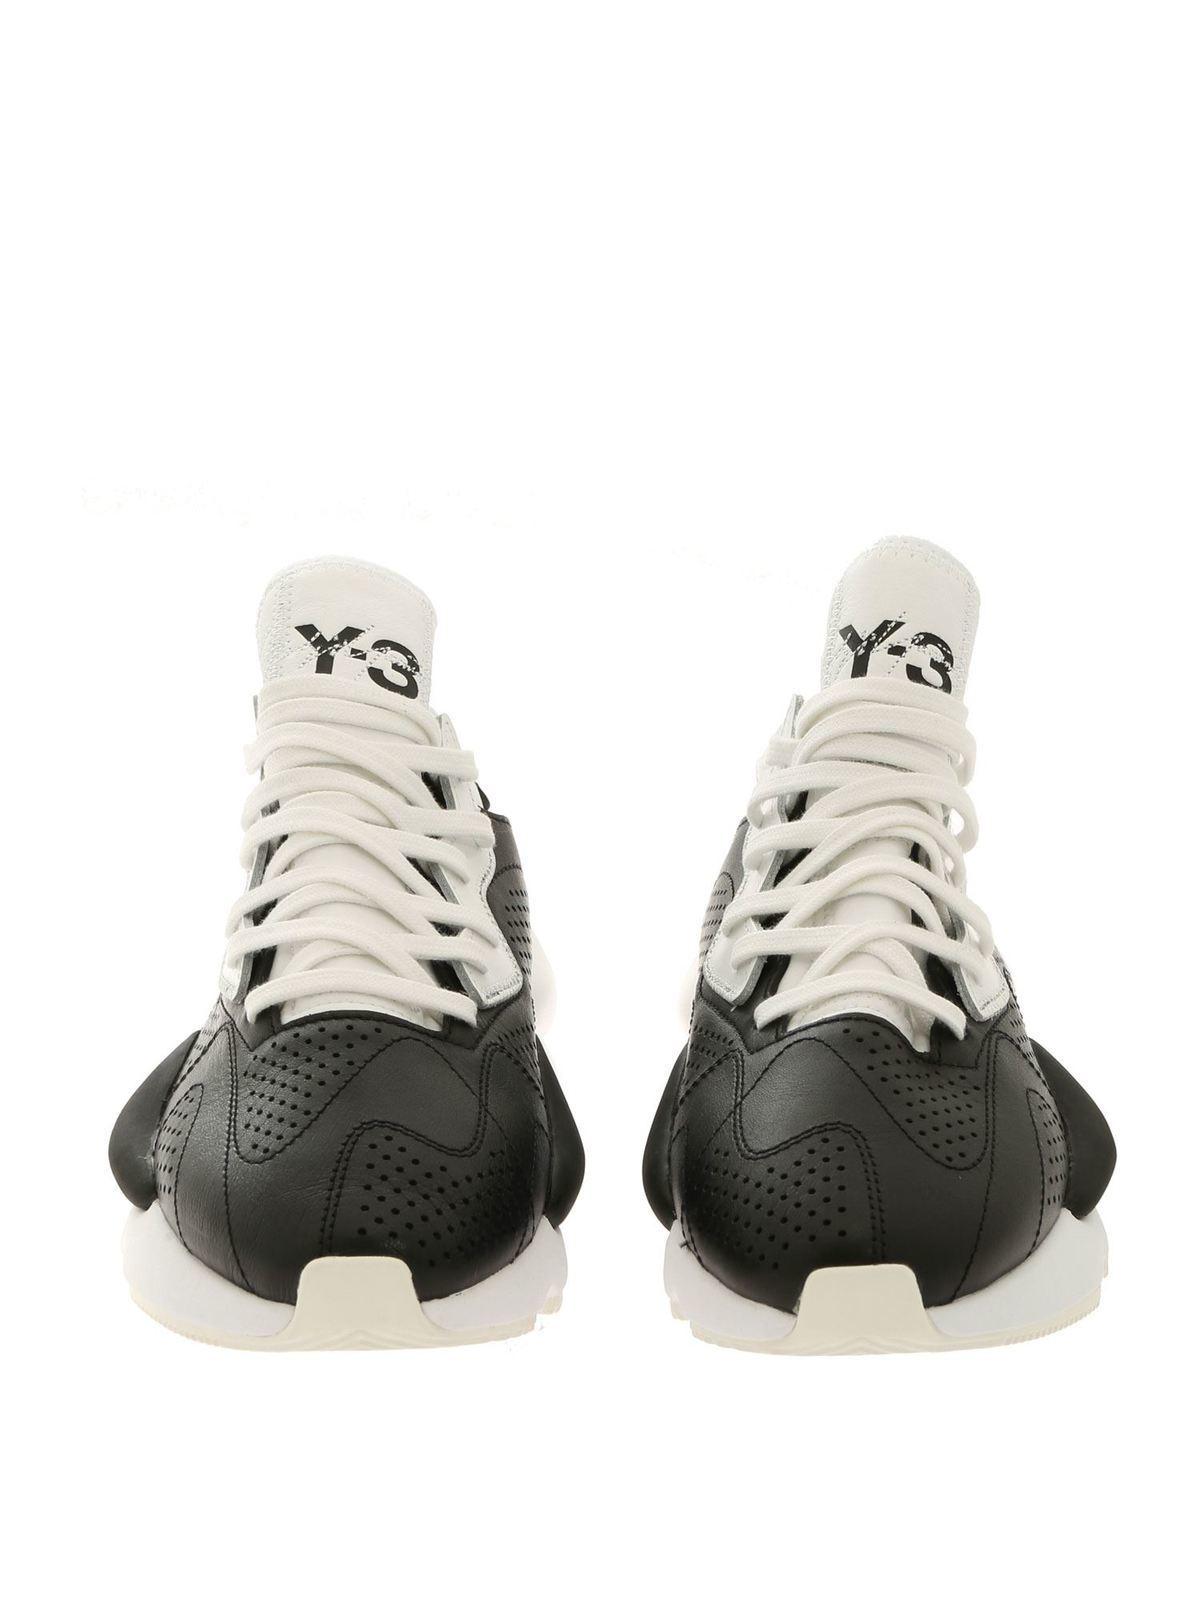 Y3 By Yohji Yamamoto - Kaiwa sneakers